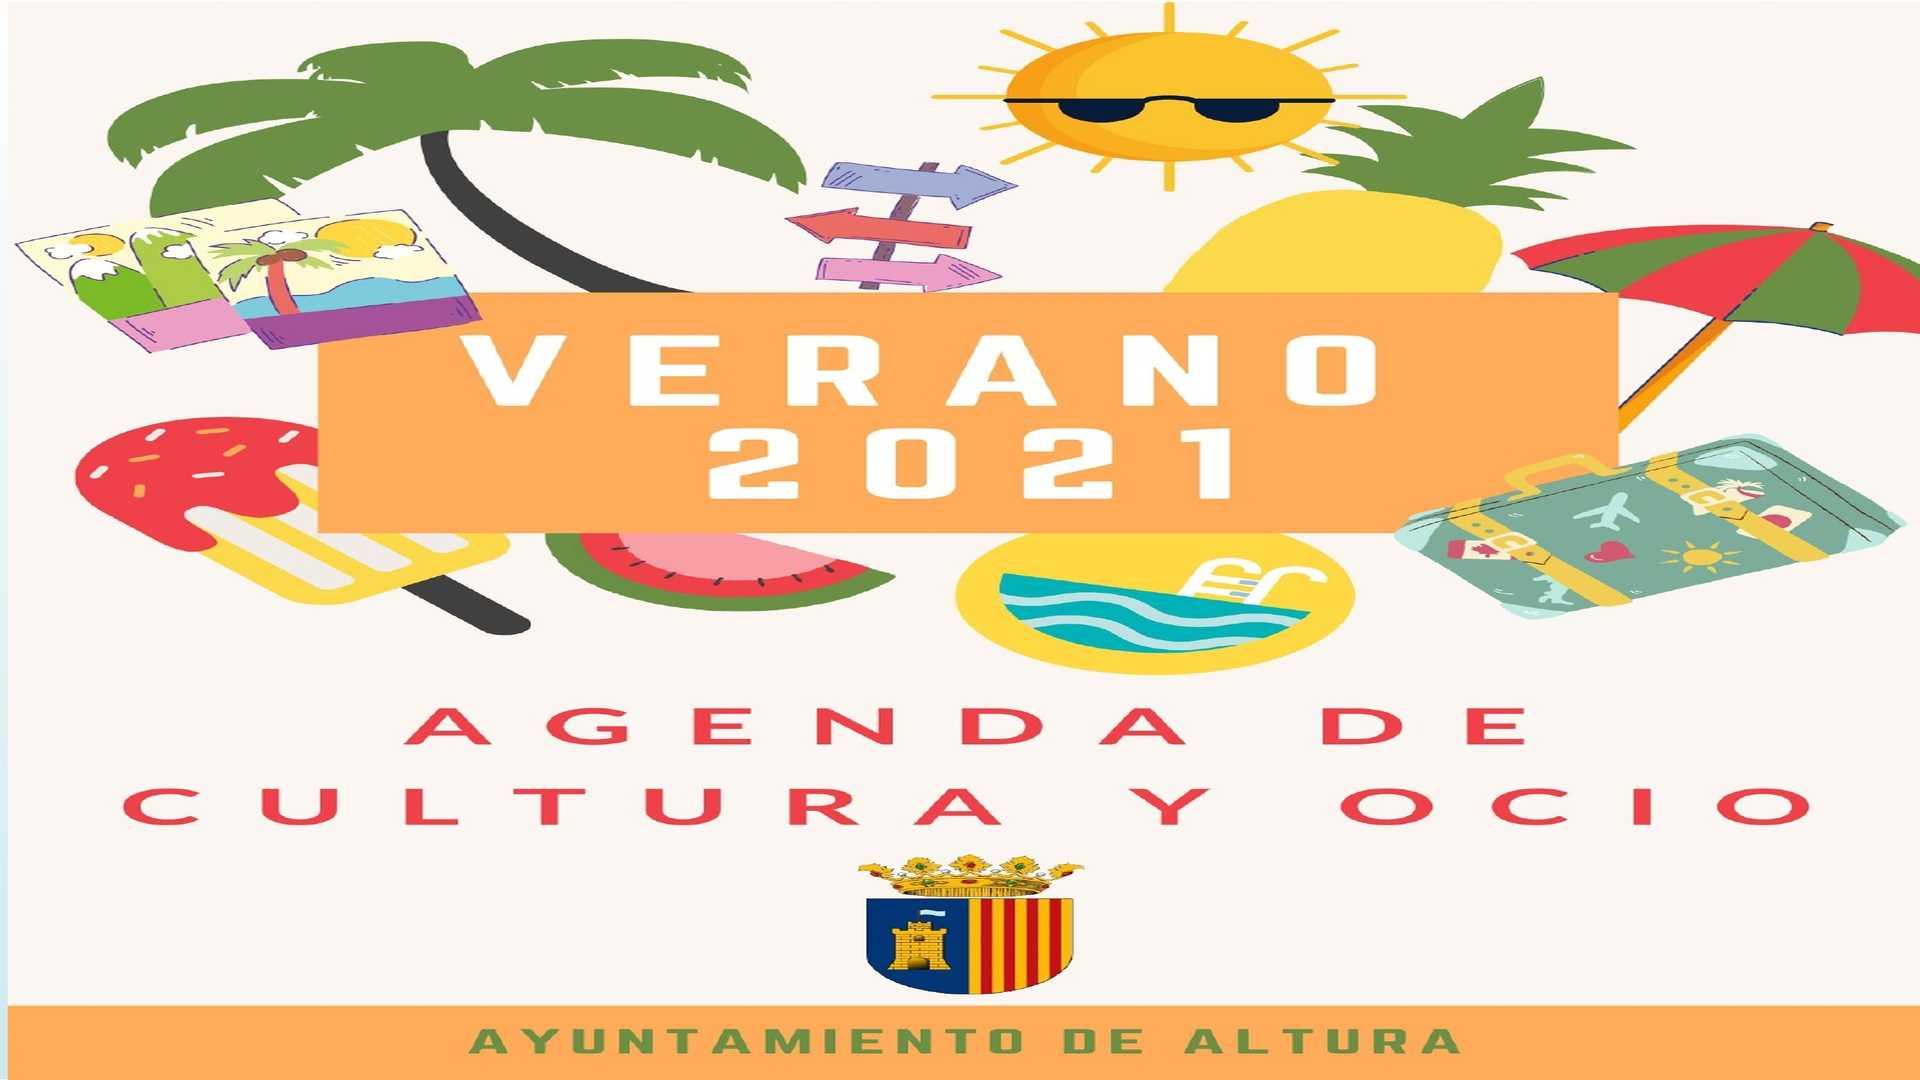 Agenda de actividades verano 2021